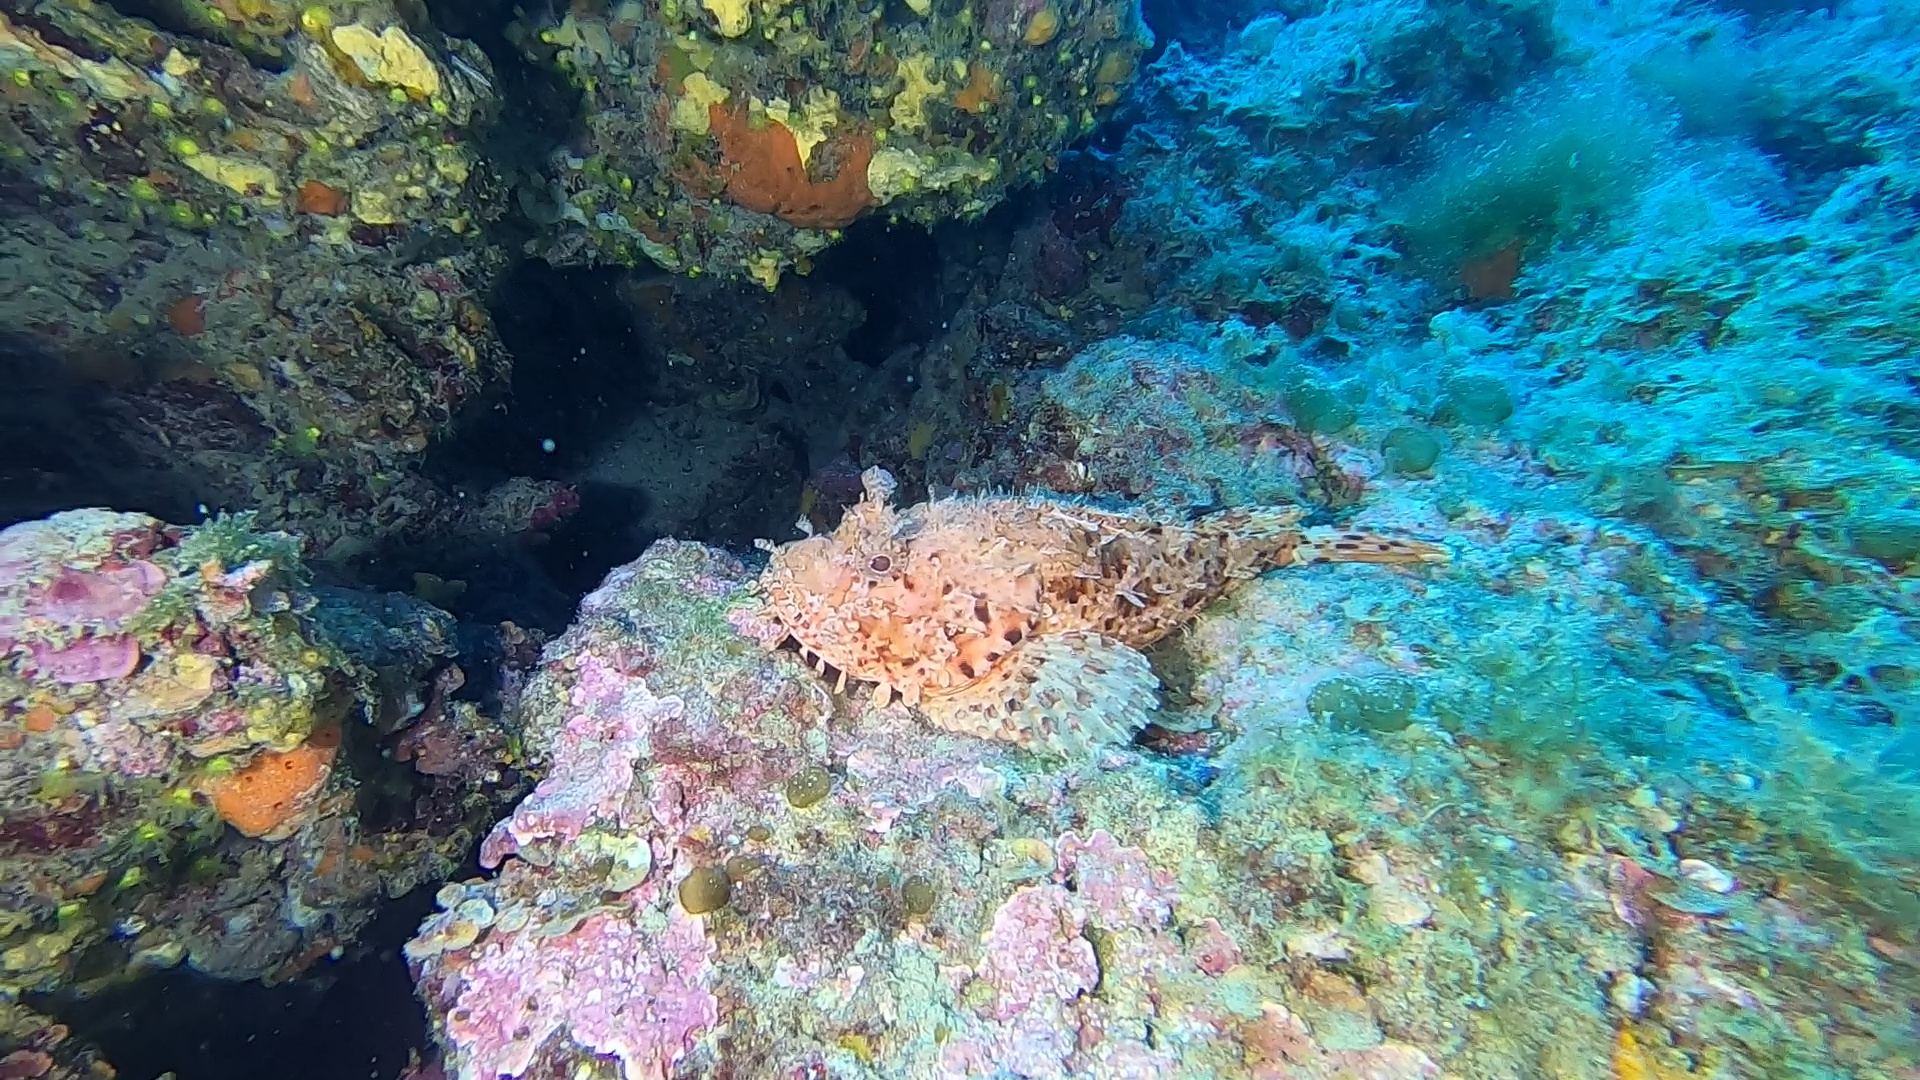 Scorfano Rosso Red Scorpionfish Scorpaena scrofa intotheblue.it